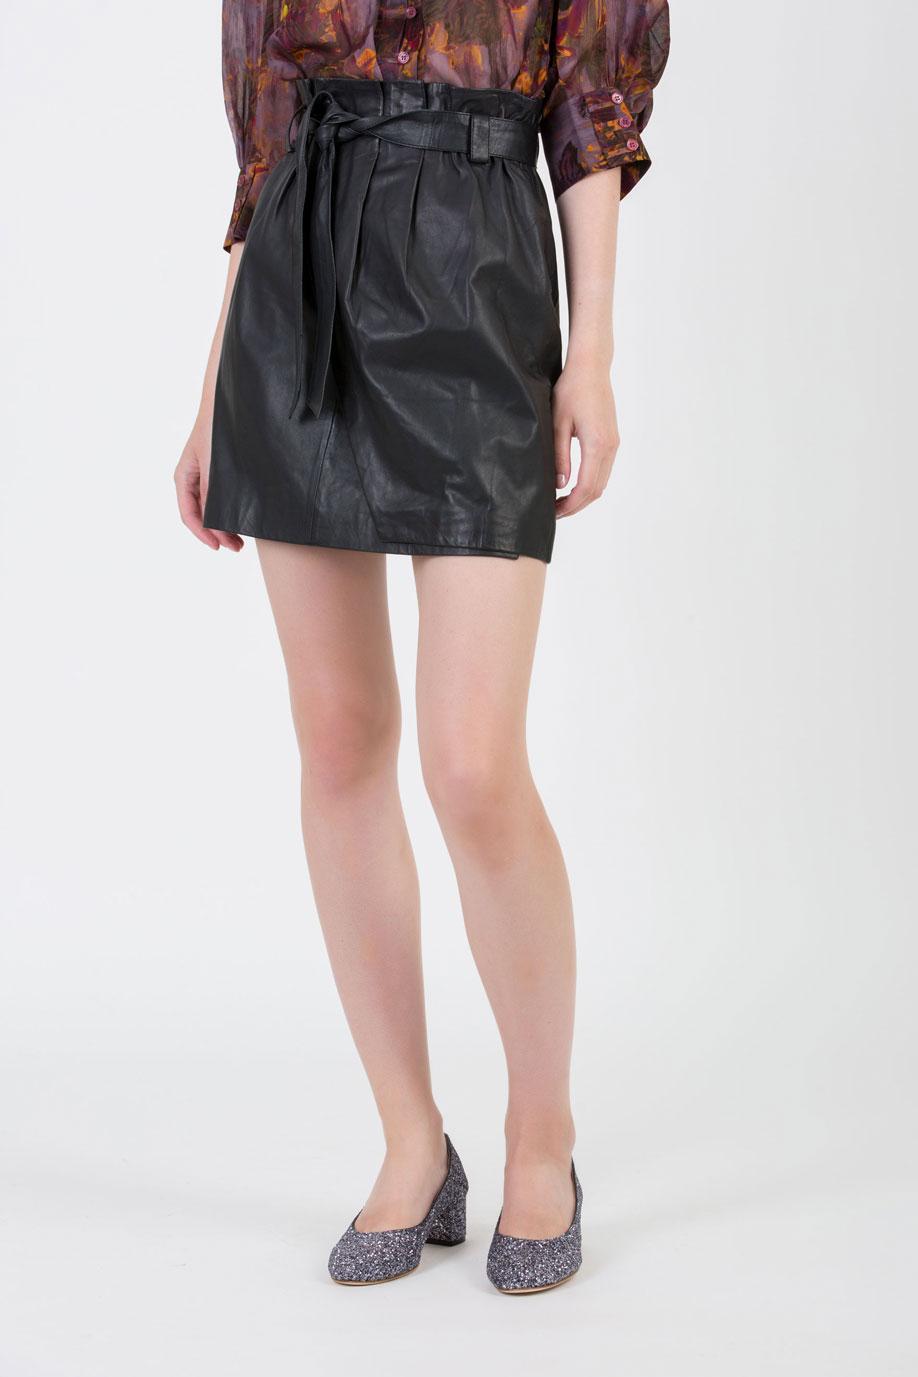 jazz-black-leather-skirt-high-wiast-berenice-matchboxathens